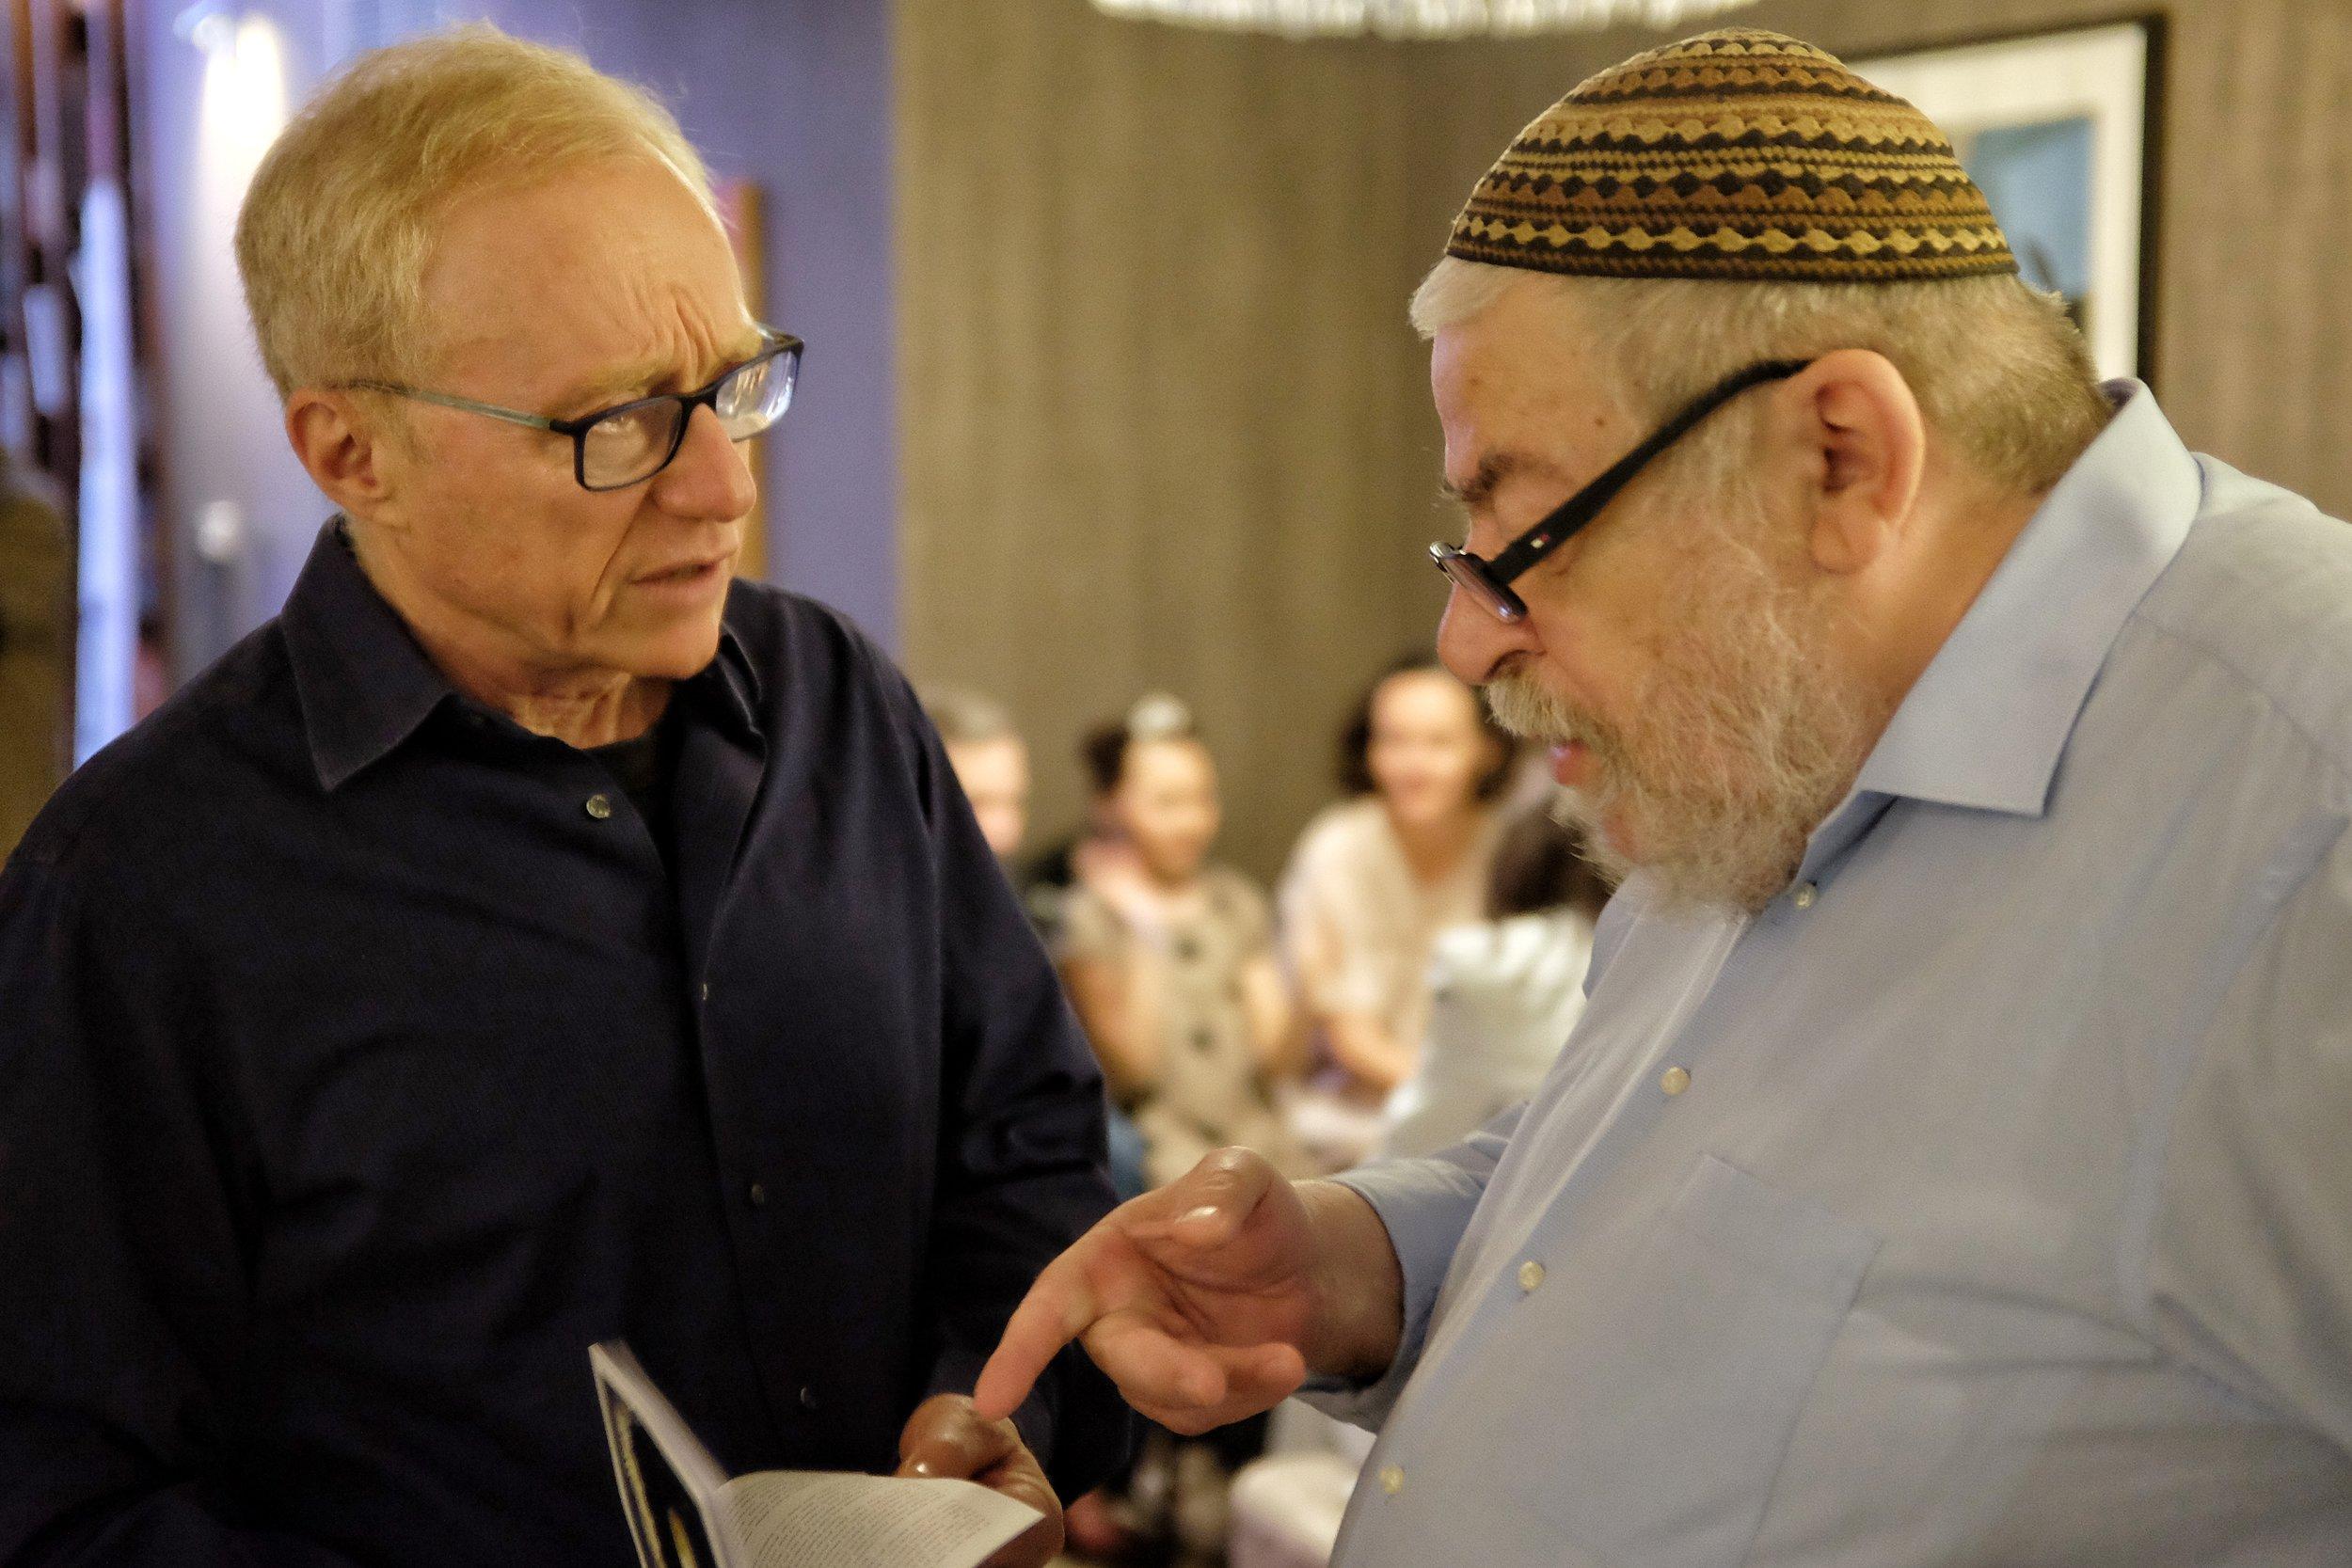 With chief rabbi, sci-fi writer, dramatist Karol Sidon.